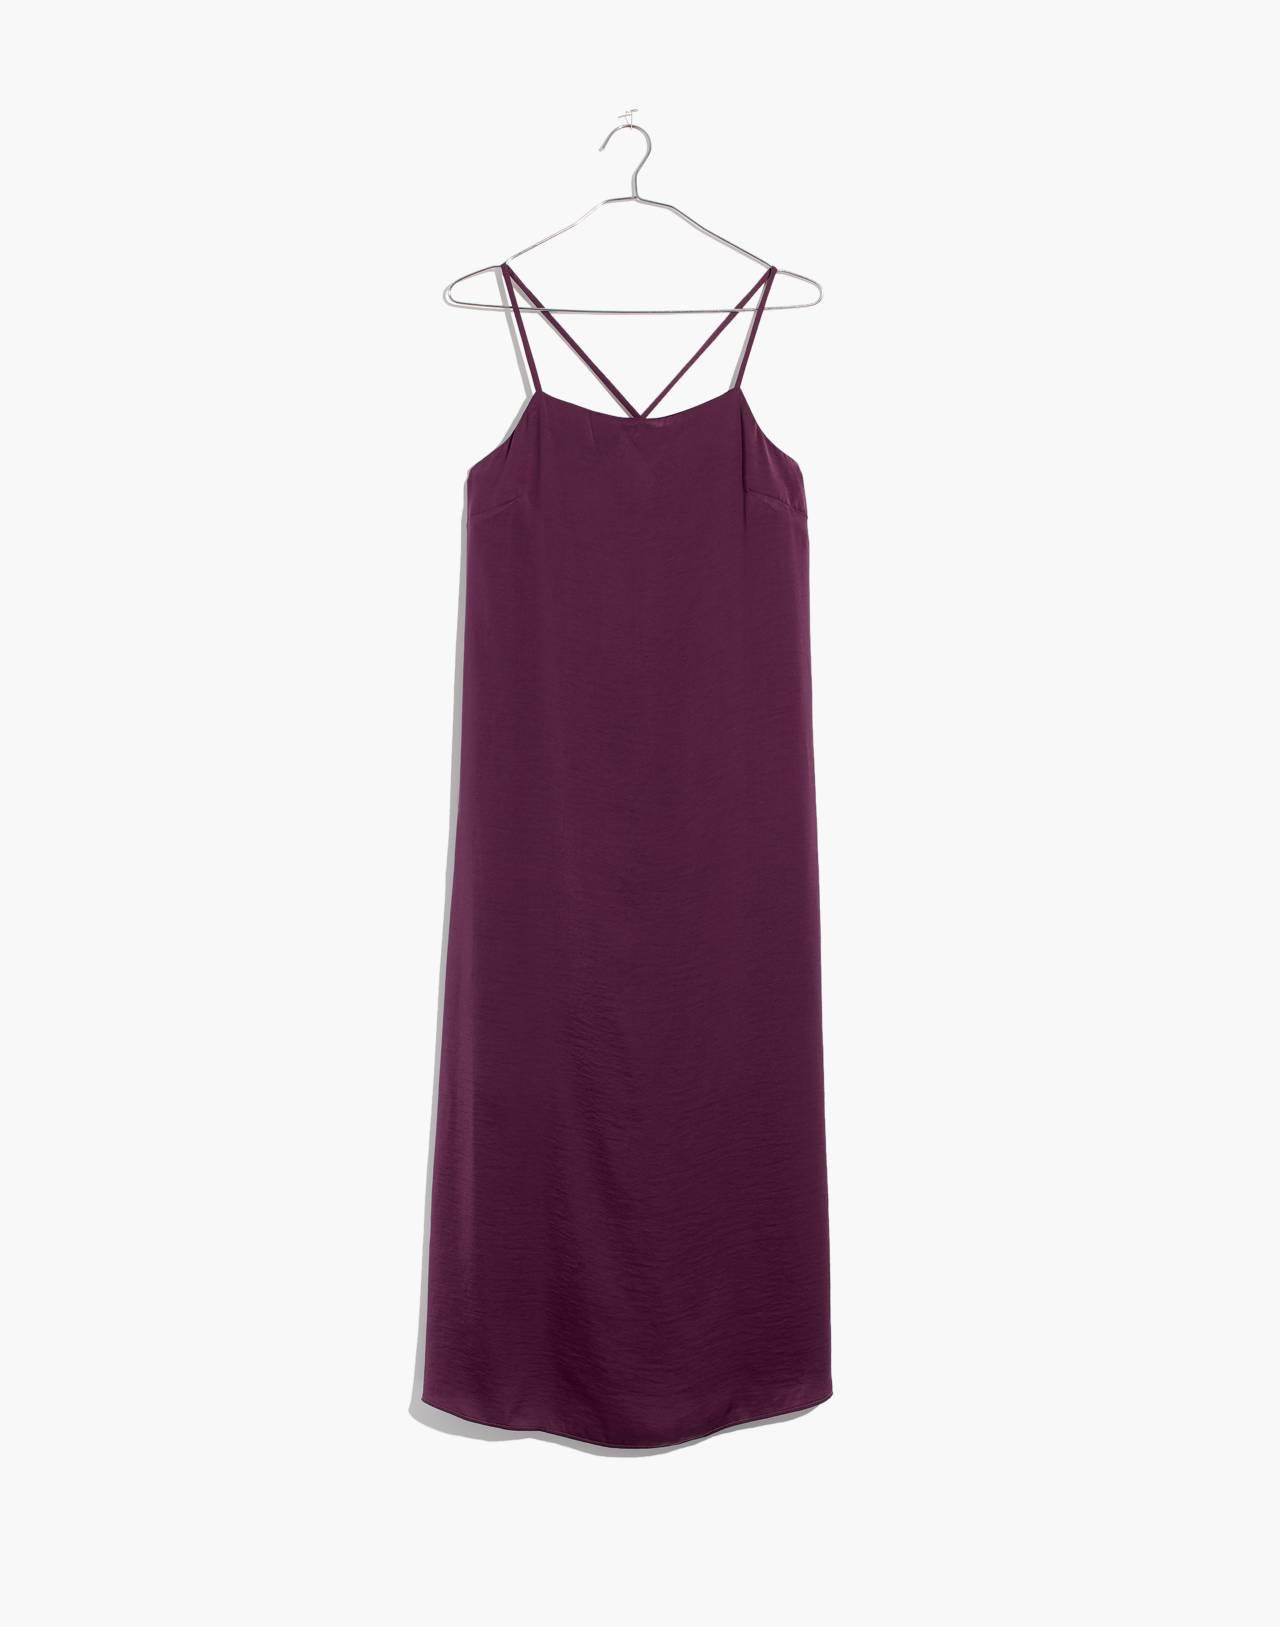 Apron Slip Dress in faded eggplant image 4